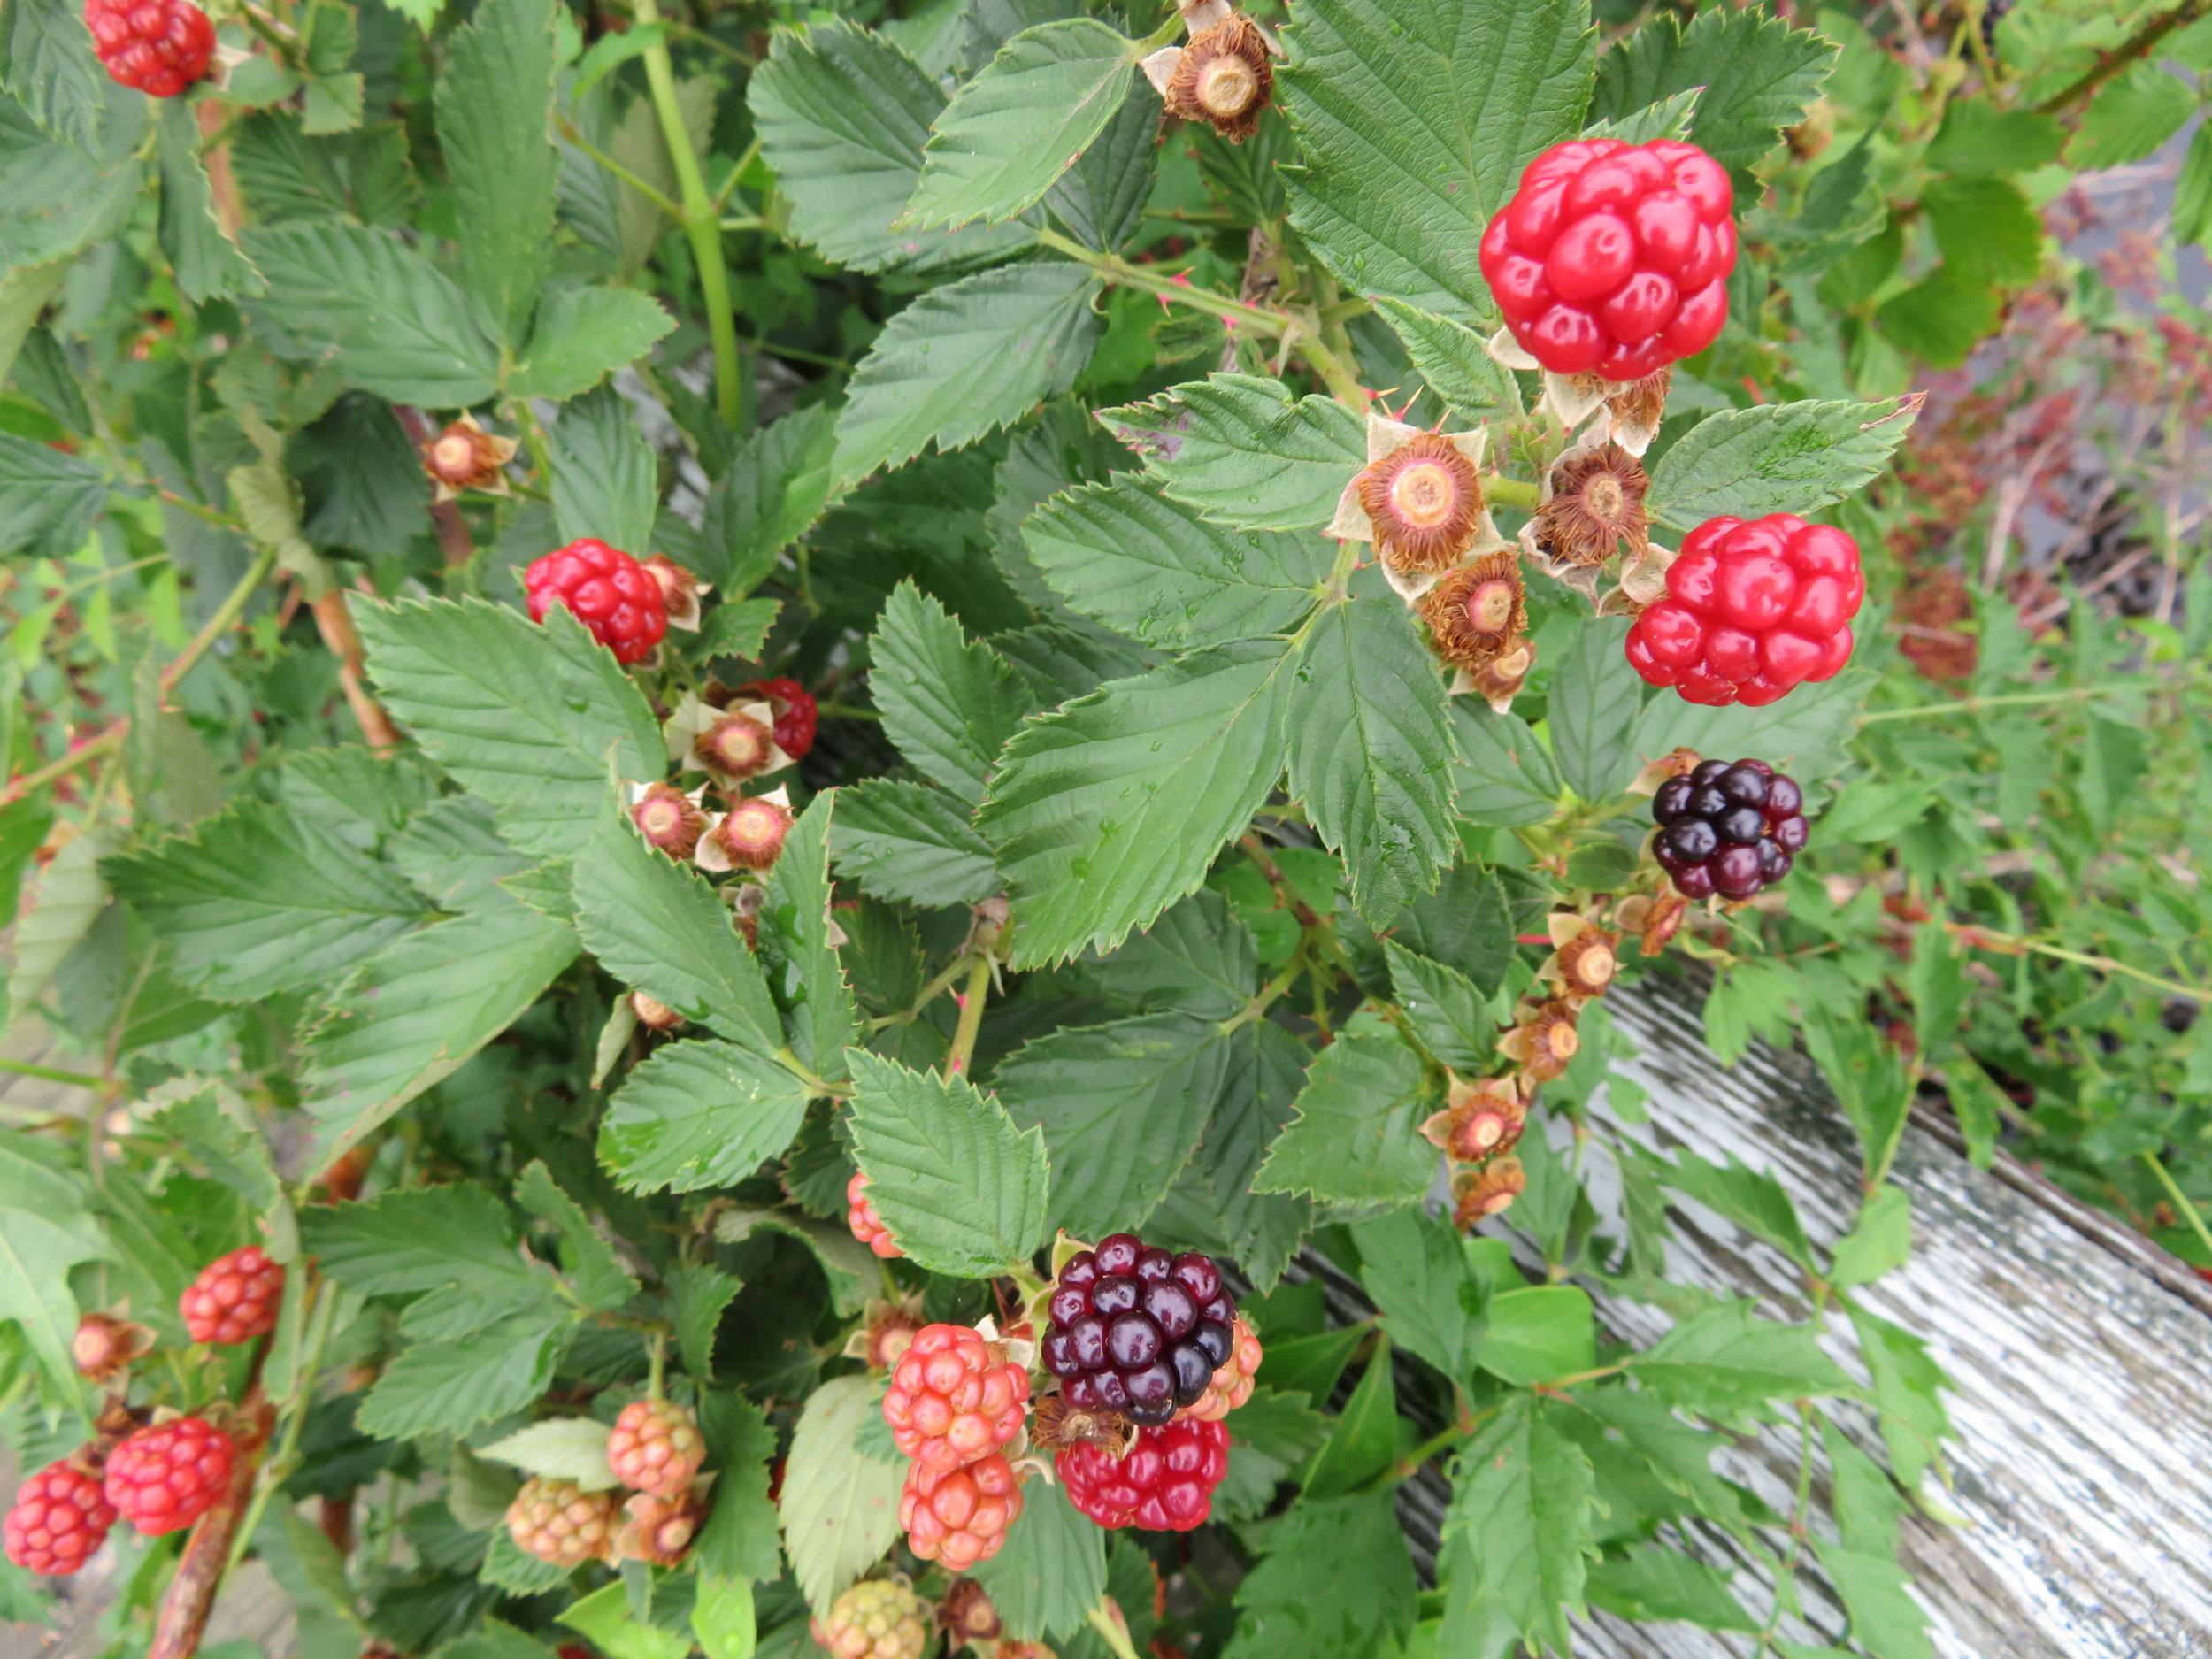 Blackberries are ripe and juicy.